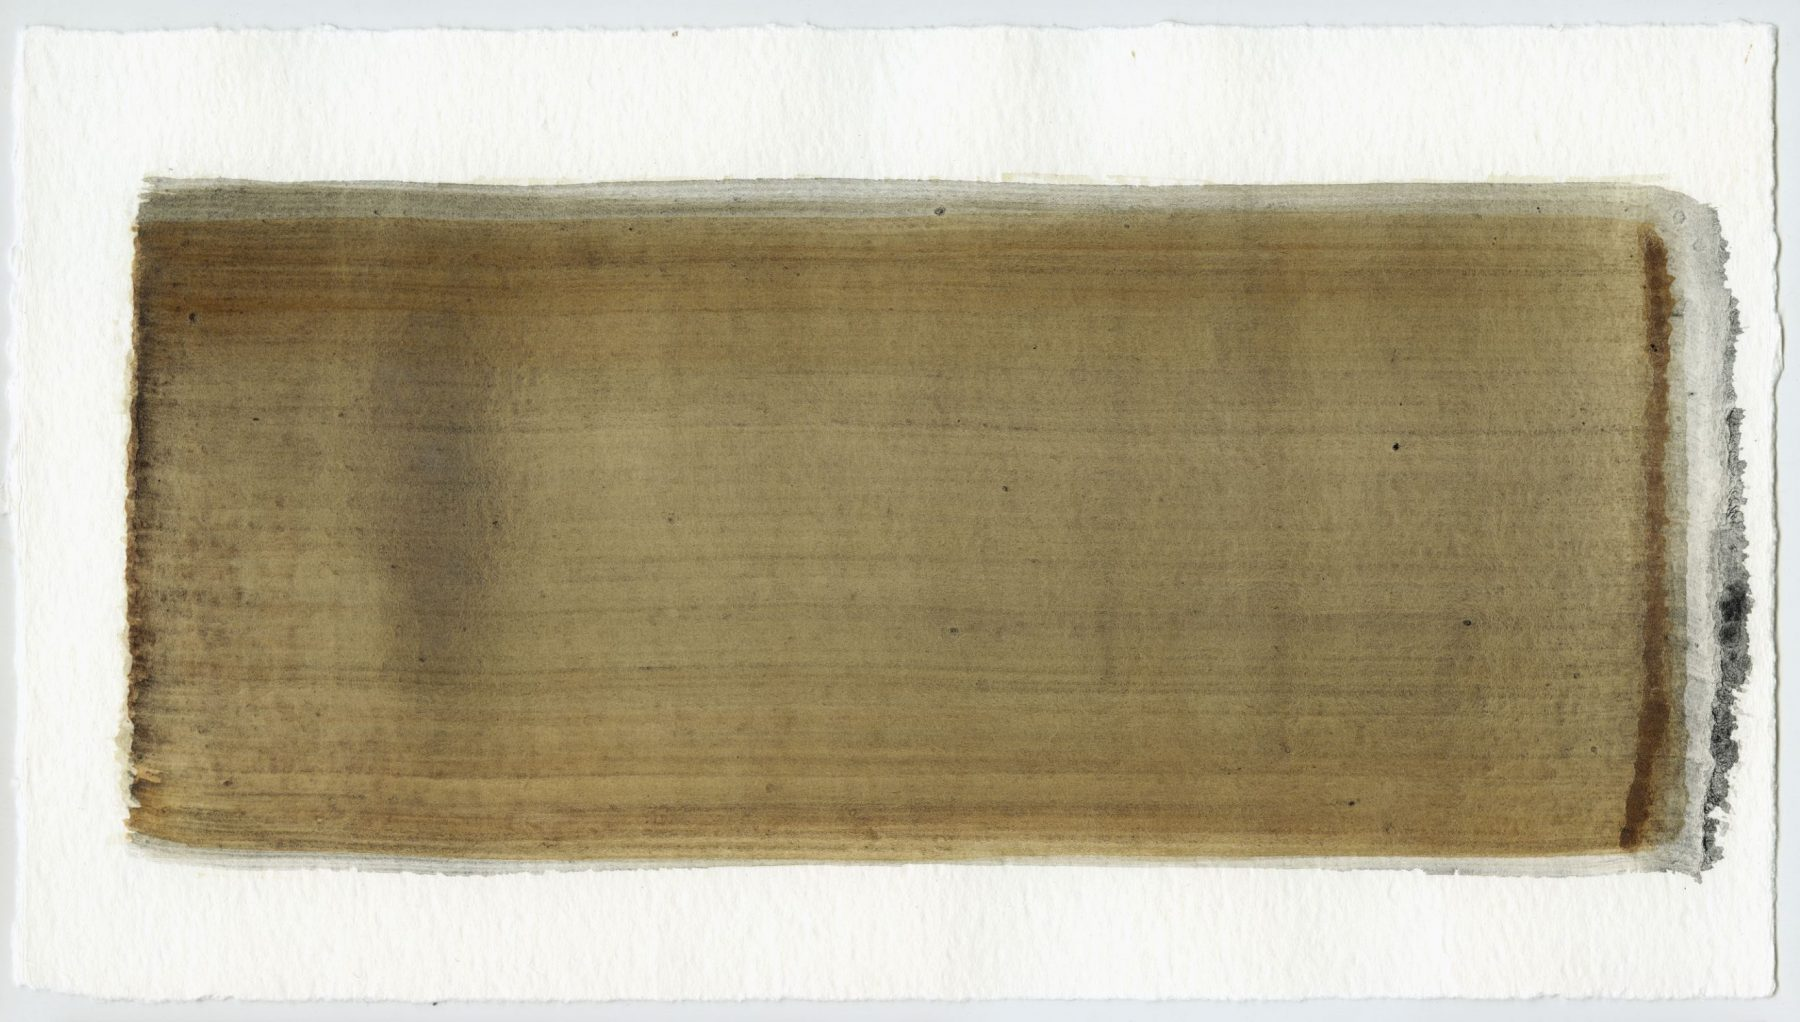 Brush stroke no. 56 - Selfmade pigment: Perekker grijs gebrand, IJzeroer, Slingerpad zwart